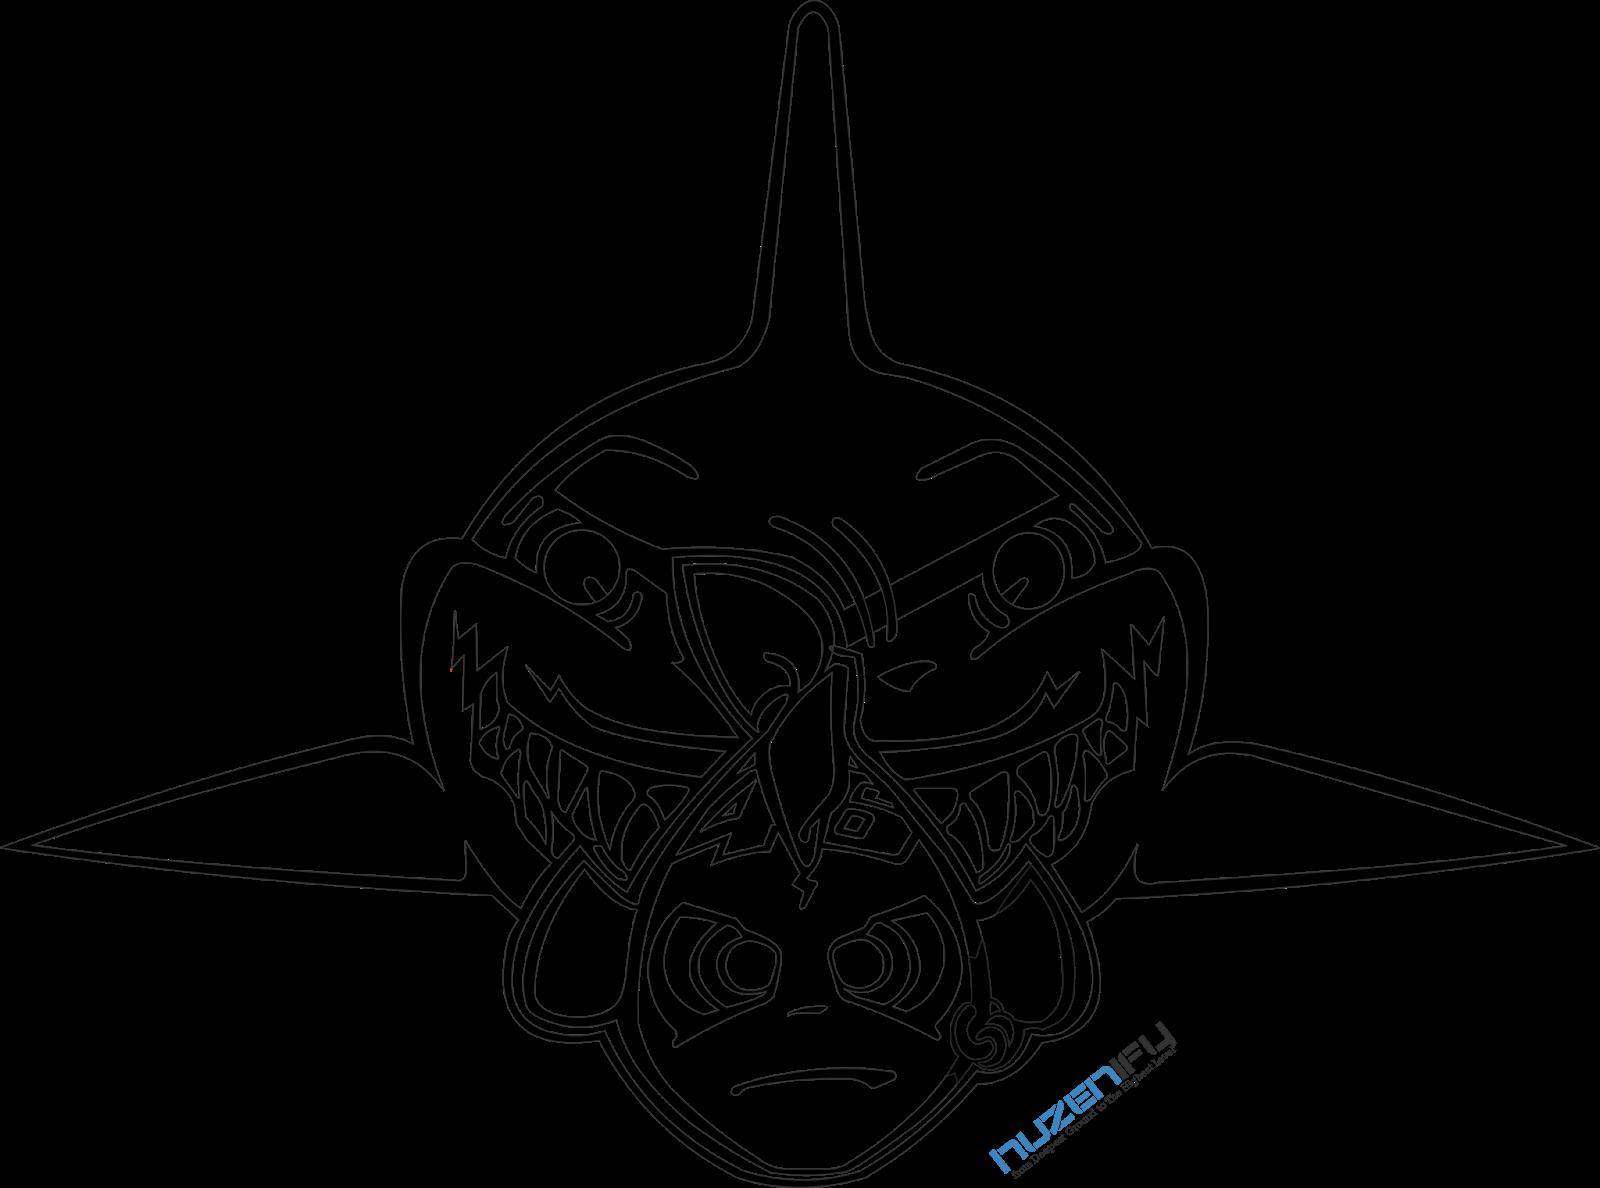 gambar vector png helm shark valentino rossi misano 2015 huzenify gambar vector png helm shark valentino